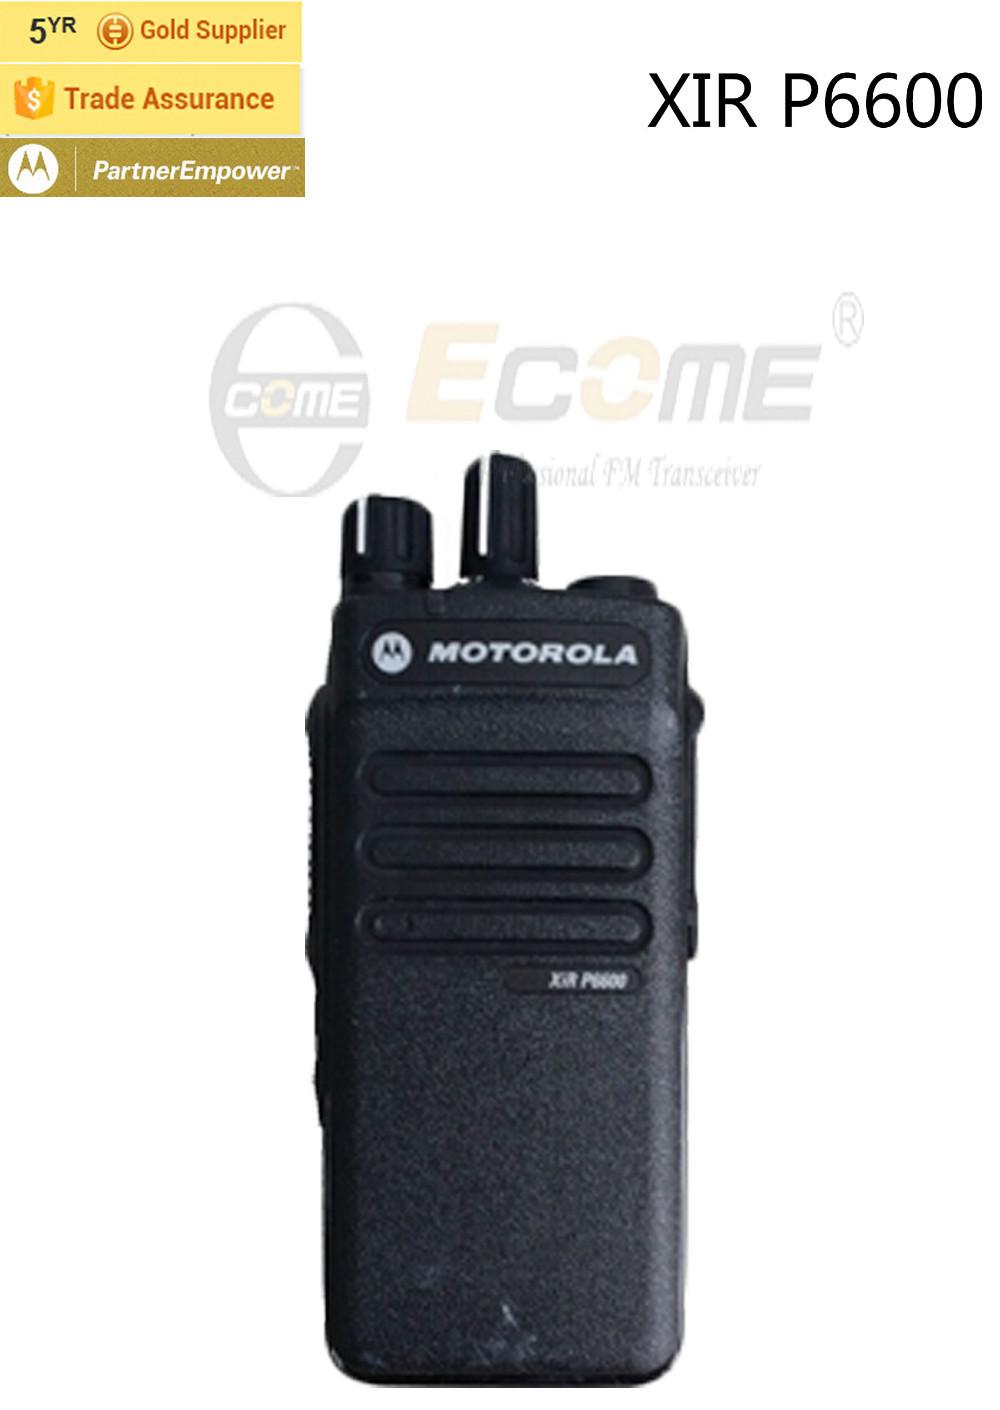 Motorola XIR P6600 Portable UHF VHF Two Way Radio(China (Mainland))